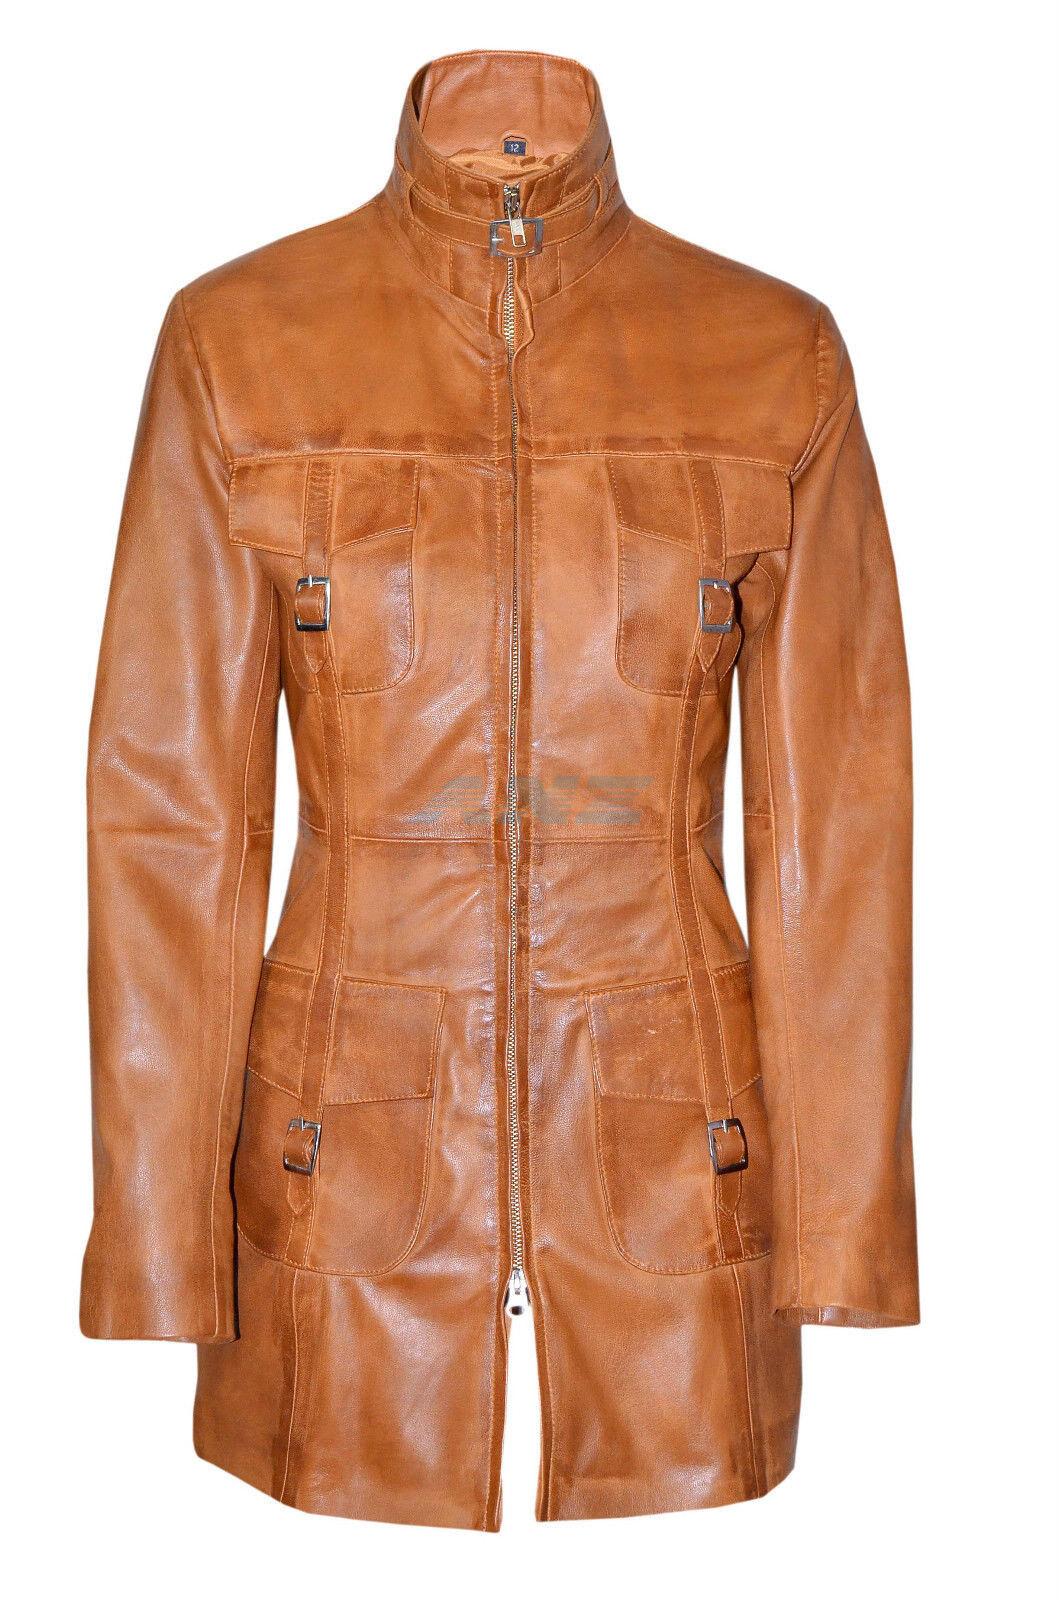 Lasvegas Dark Red Ladies Women Vintage Soft Washed Leather Jacket Trench Coat